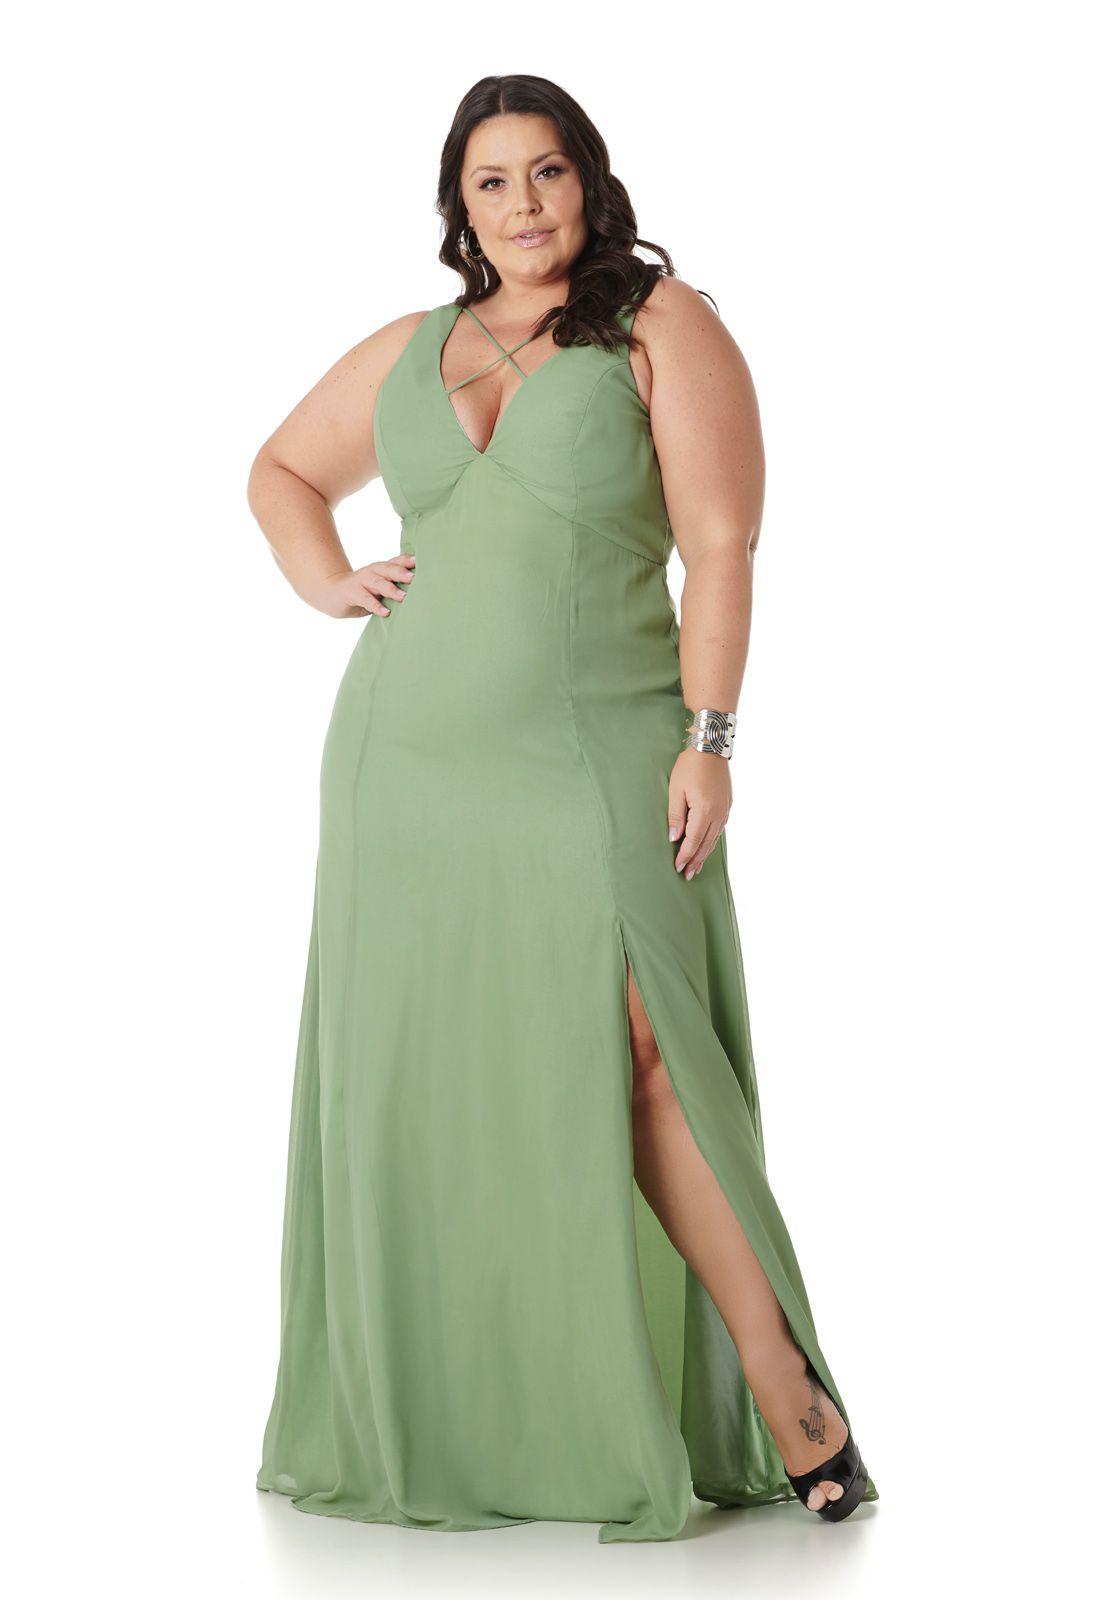 Vestido Longo Plus Size Verde Claro Lala Dubi